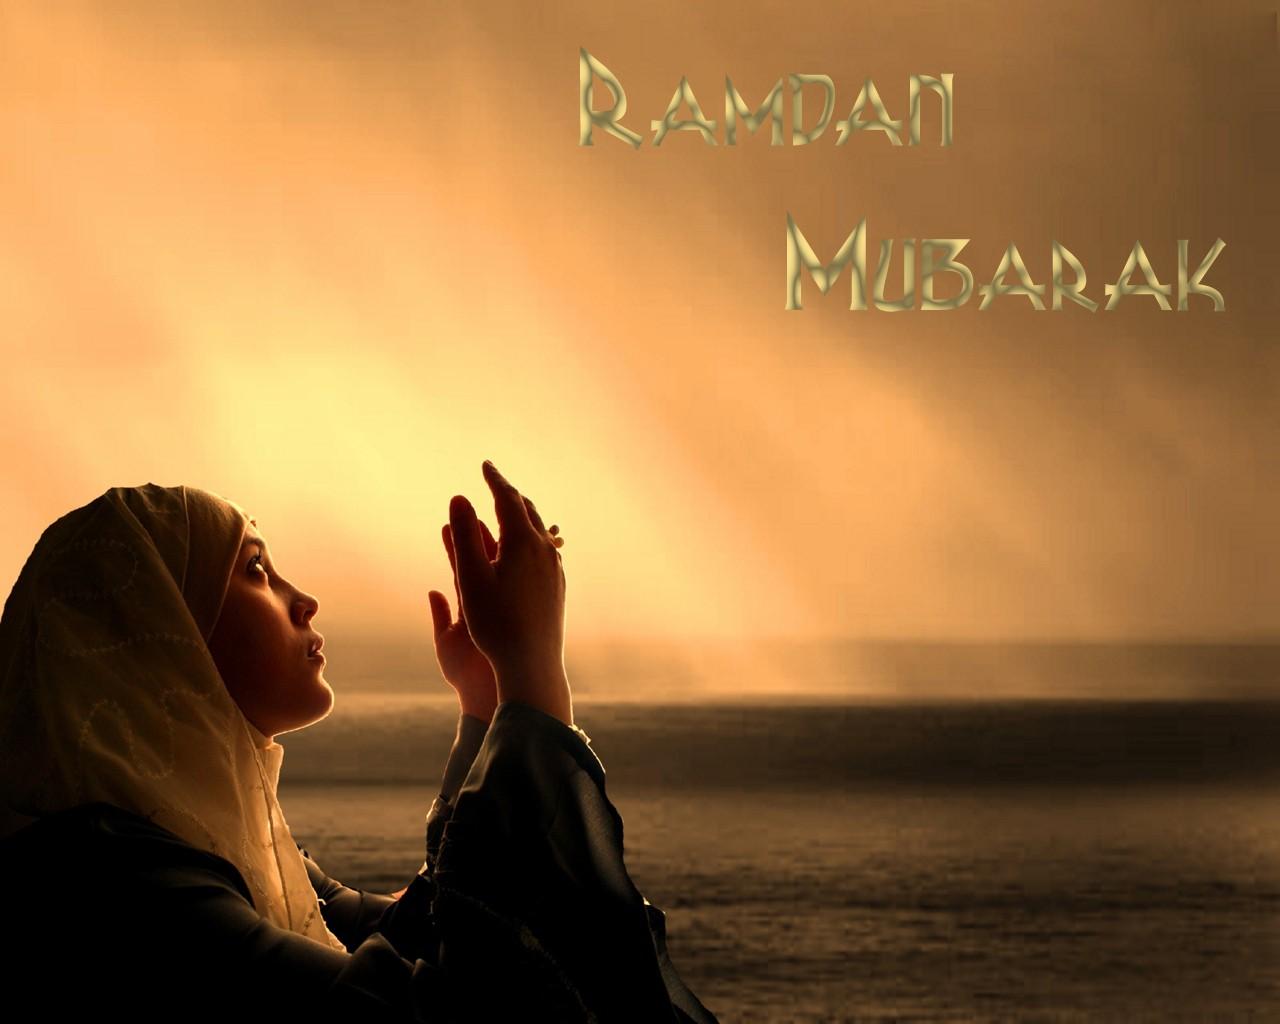 Eid mubarak shayari messageswallpapersin englishurduarabic eid mubarak shayari in hindi 2017 kristyandbryce Choice Image